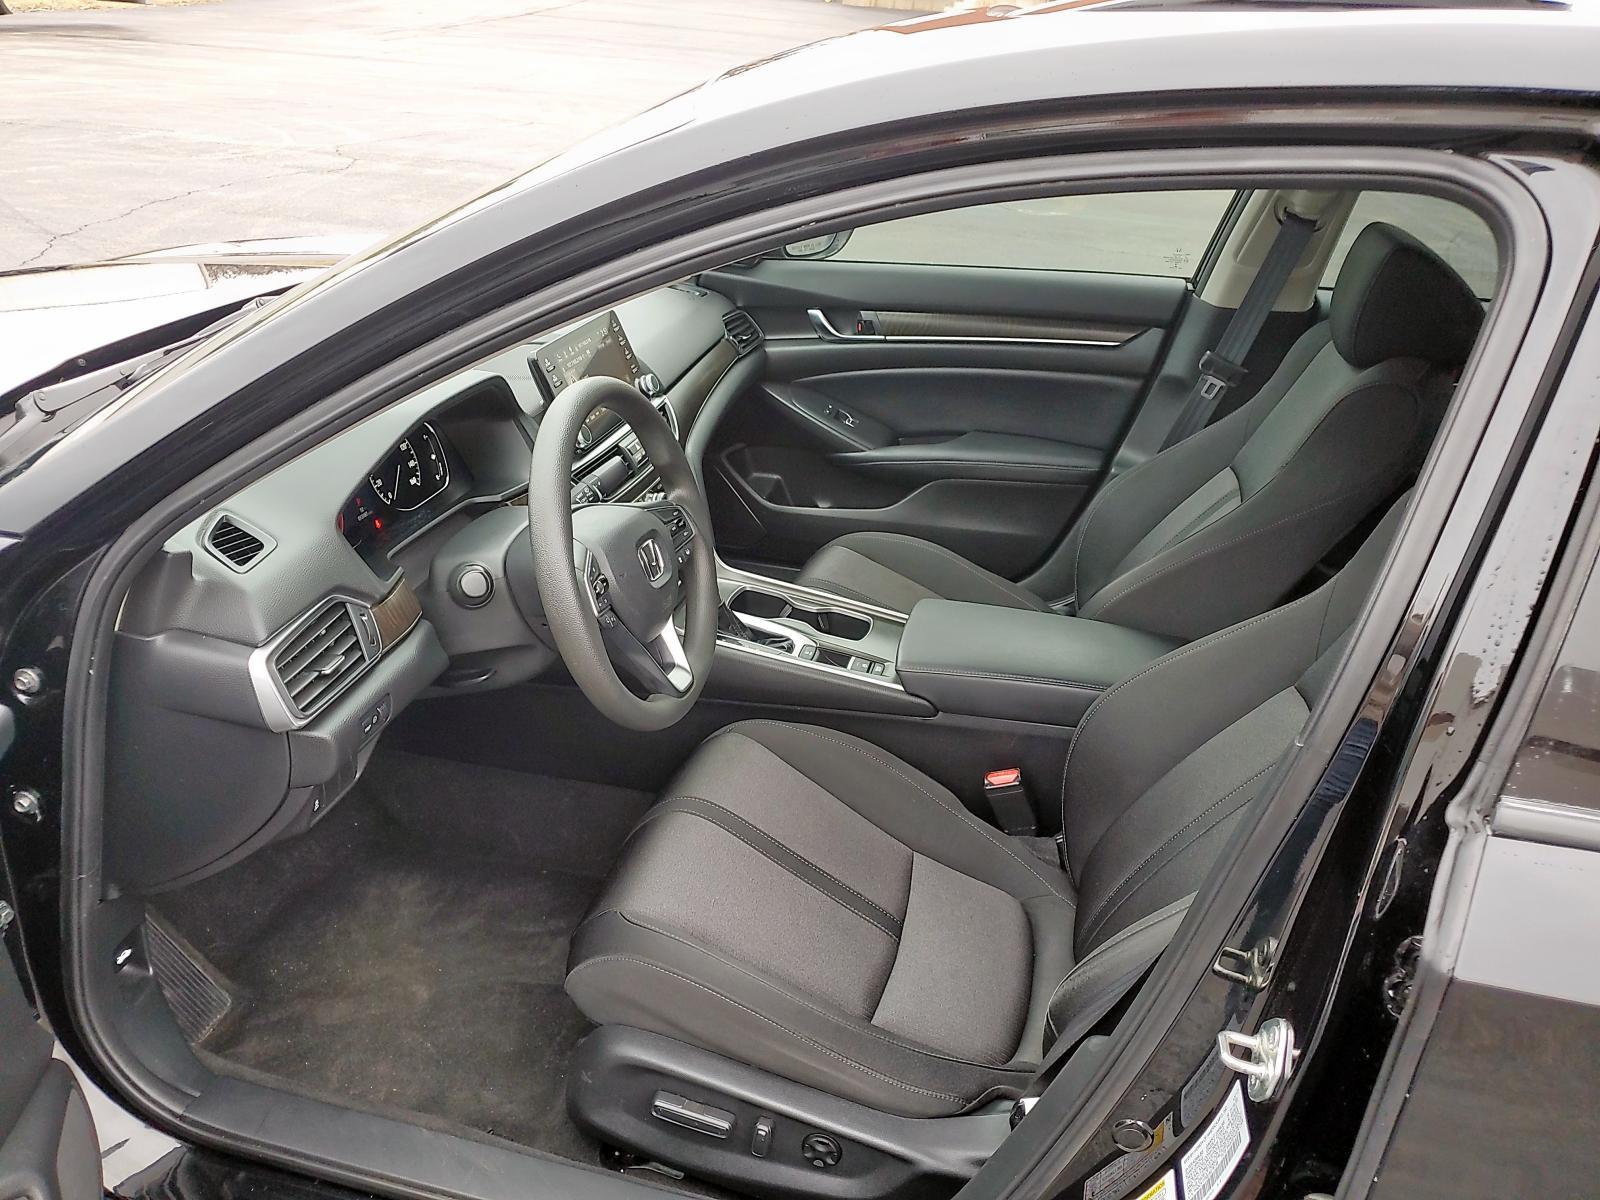 1HGCV1F46JA076138 - 2018 Honda Accord Ex 1.5L engine view